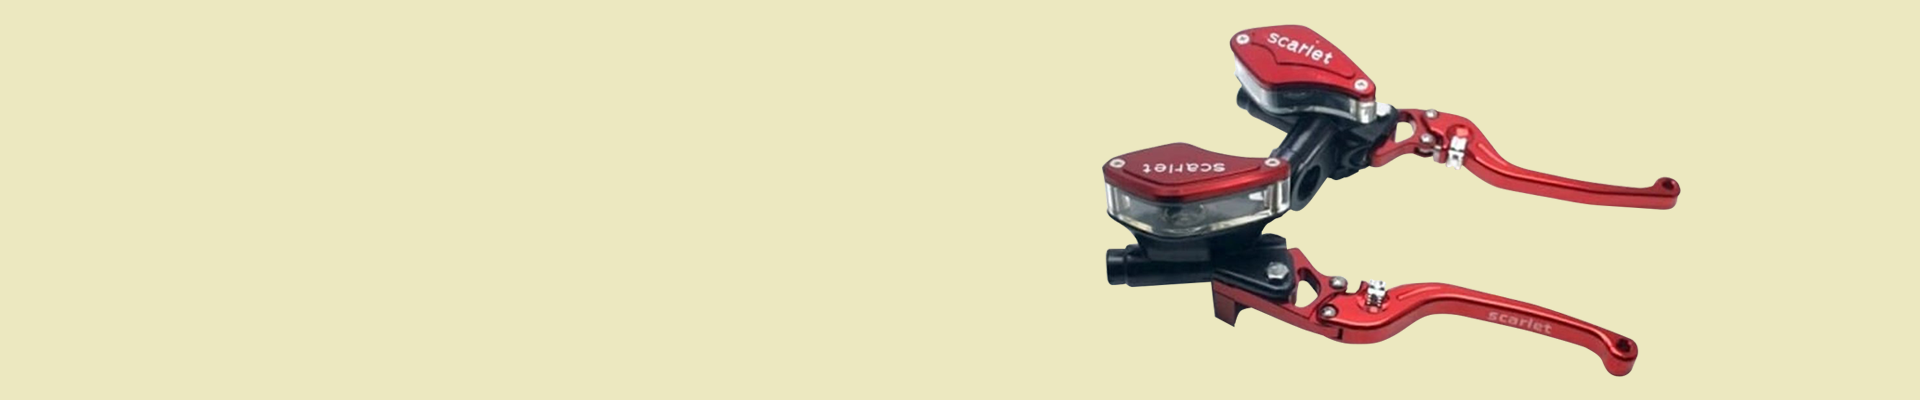 Jual Master & Piringan Rem Motor Berkualitas